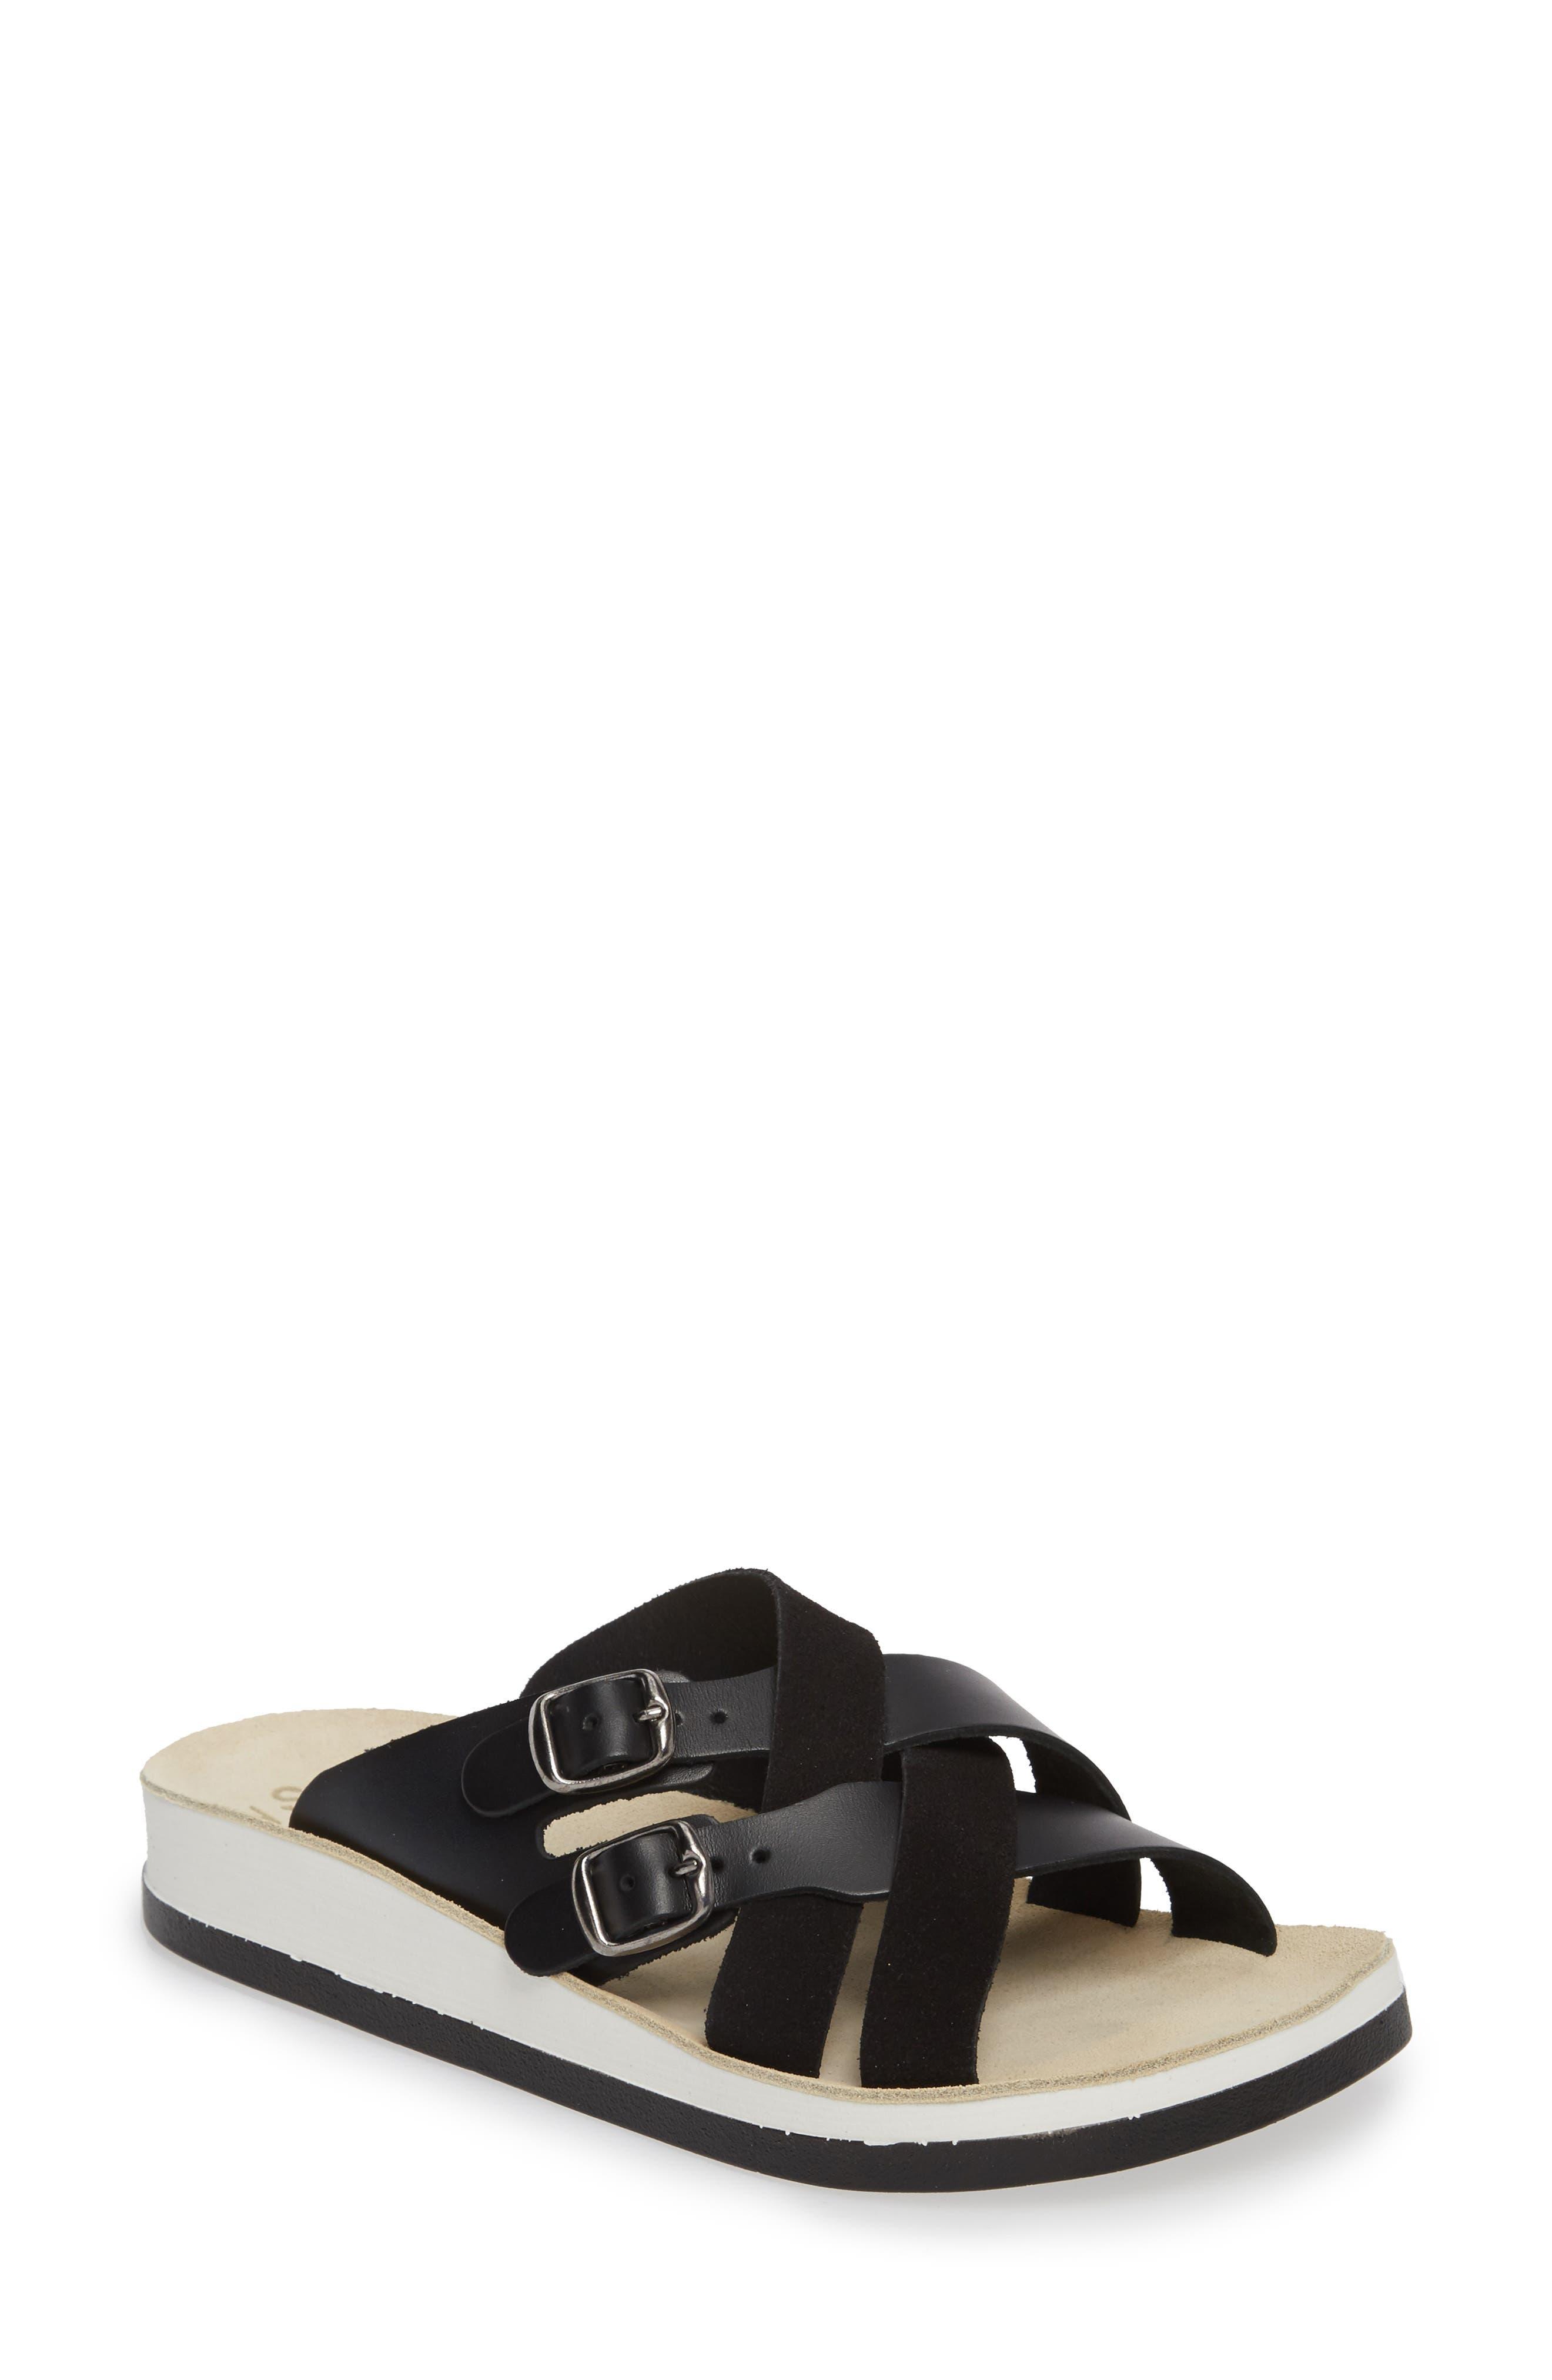 Silvia Slide Sandal,                         Main,                         color, BLACK LEATHER